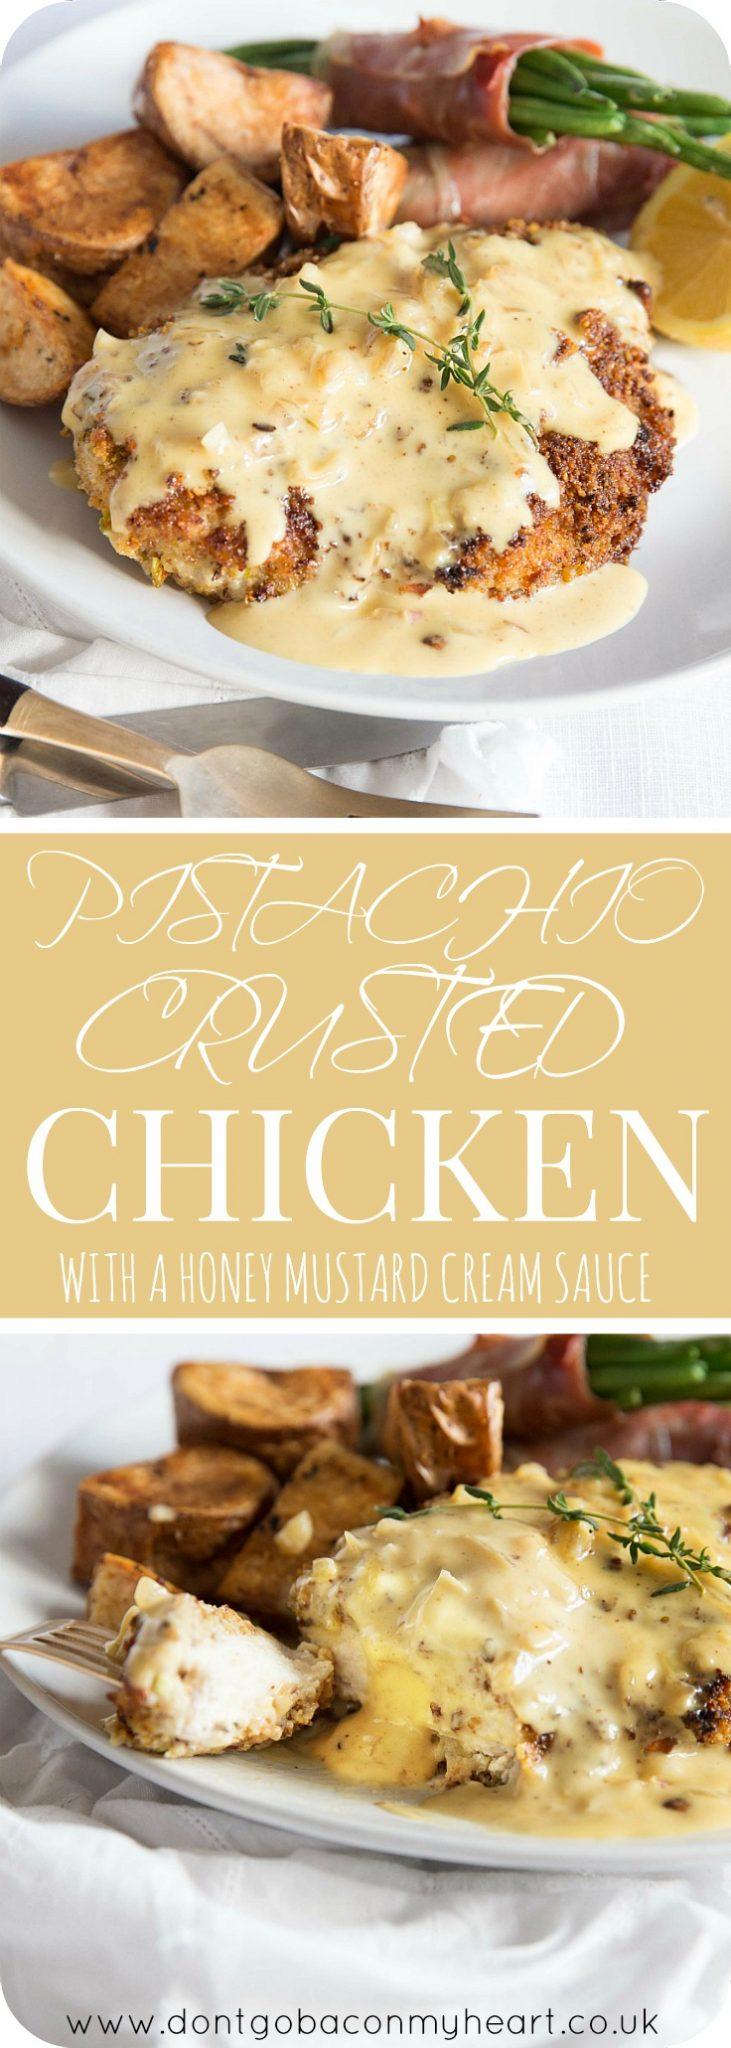 Pistachio Crusted Chicken with Honey Mustard Cream Sauce Pin